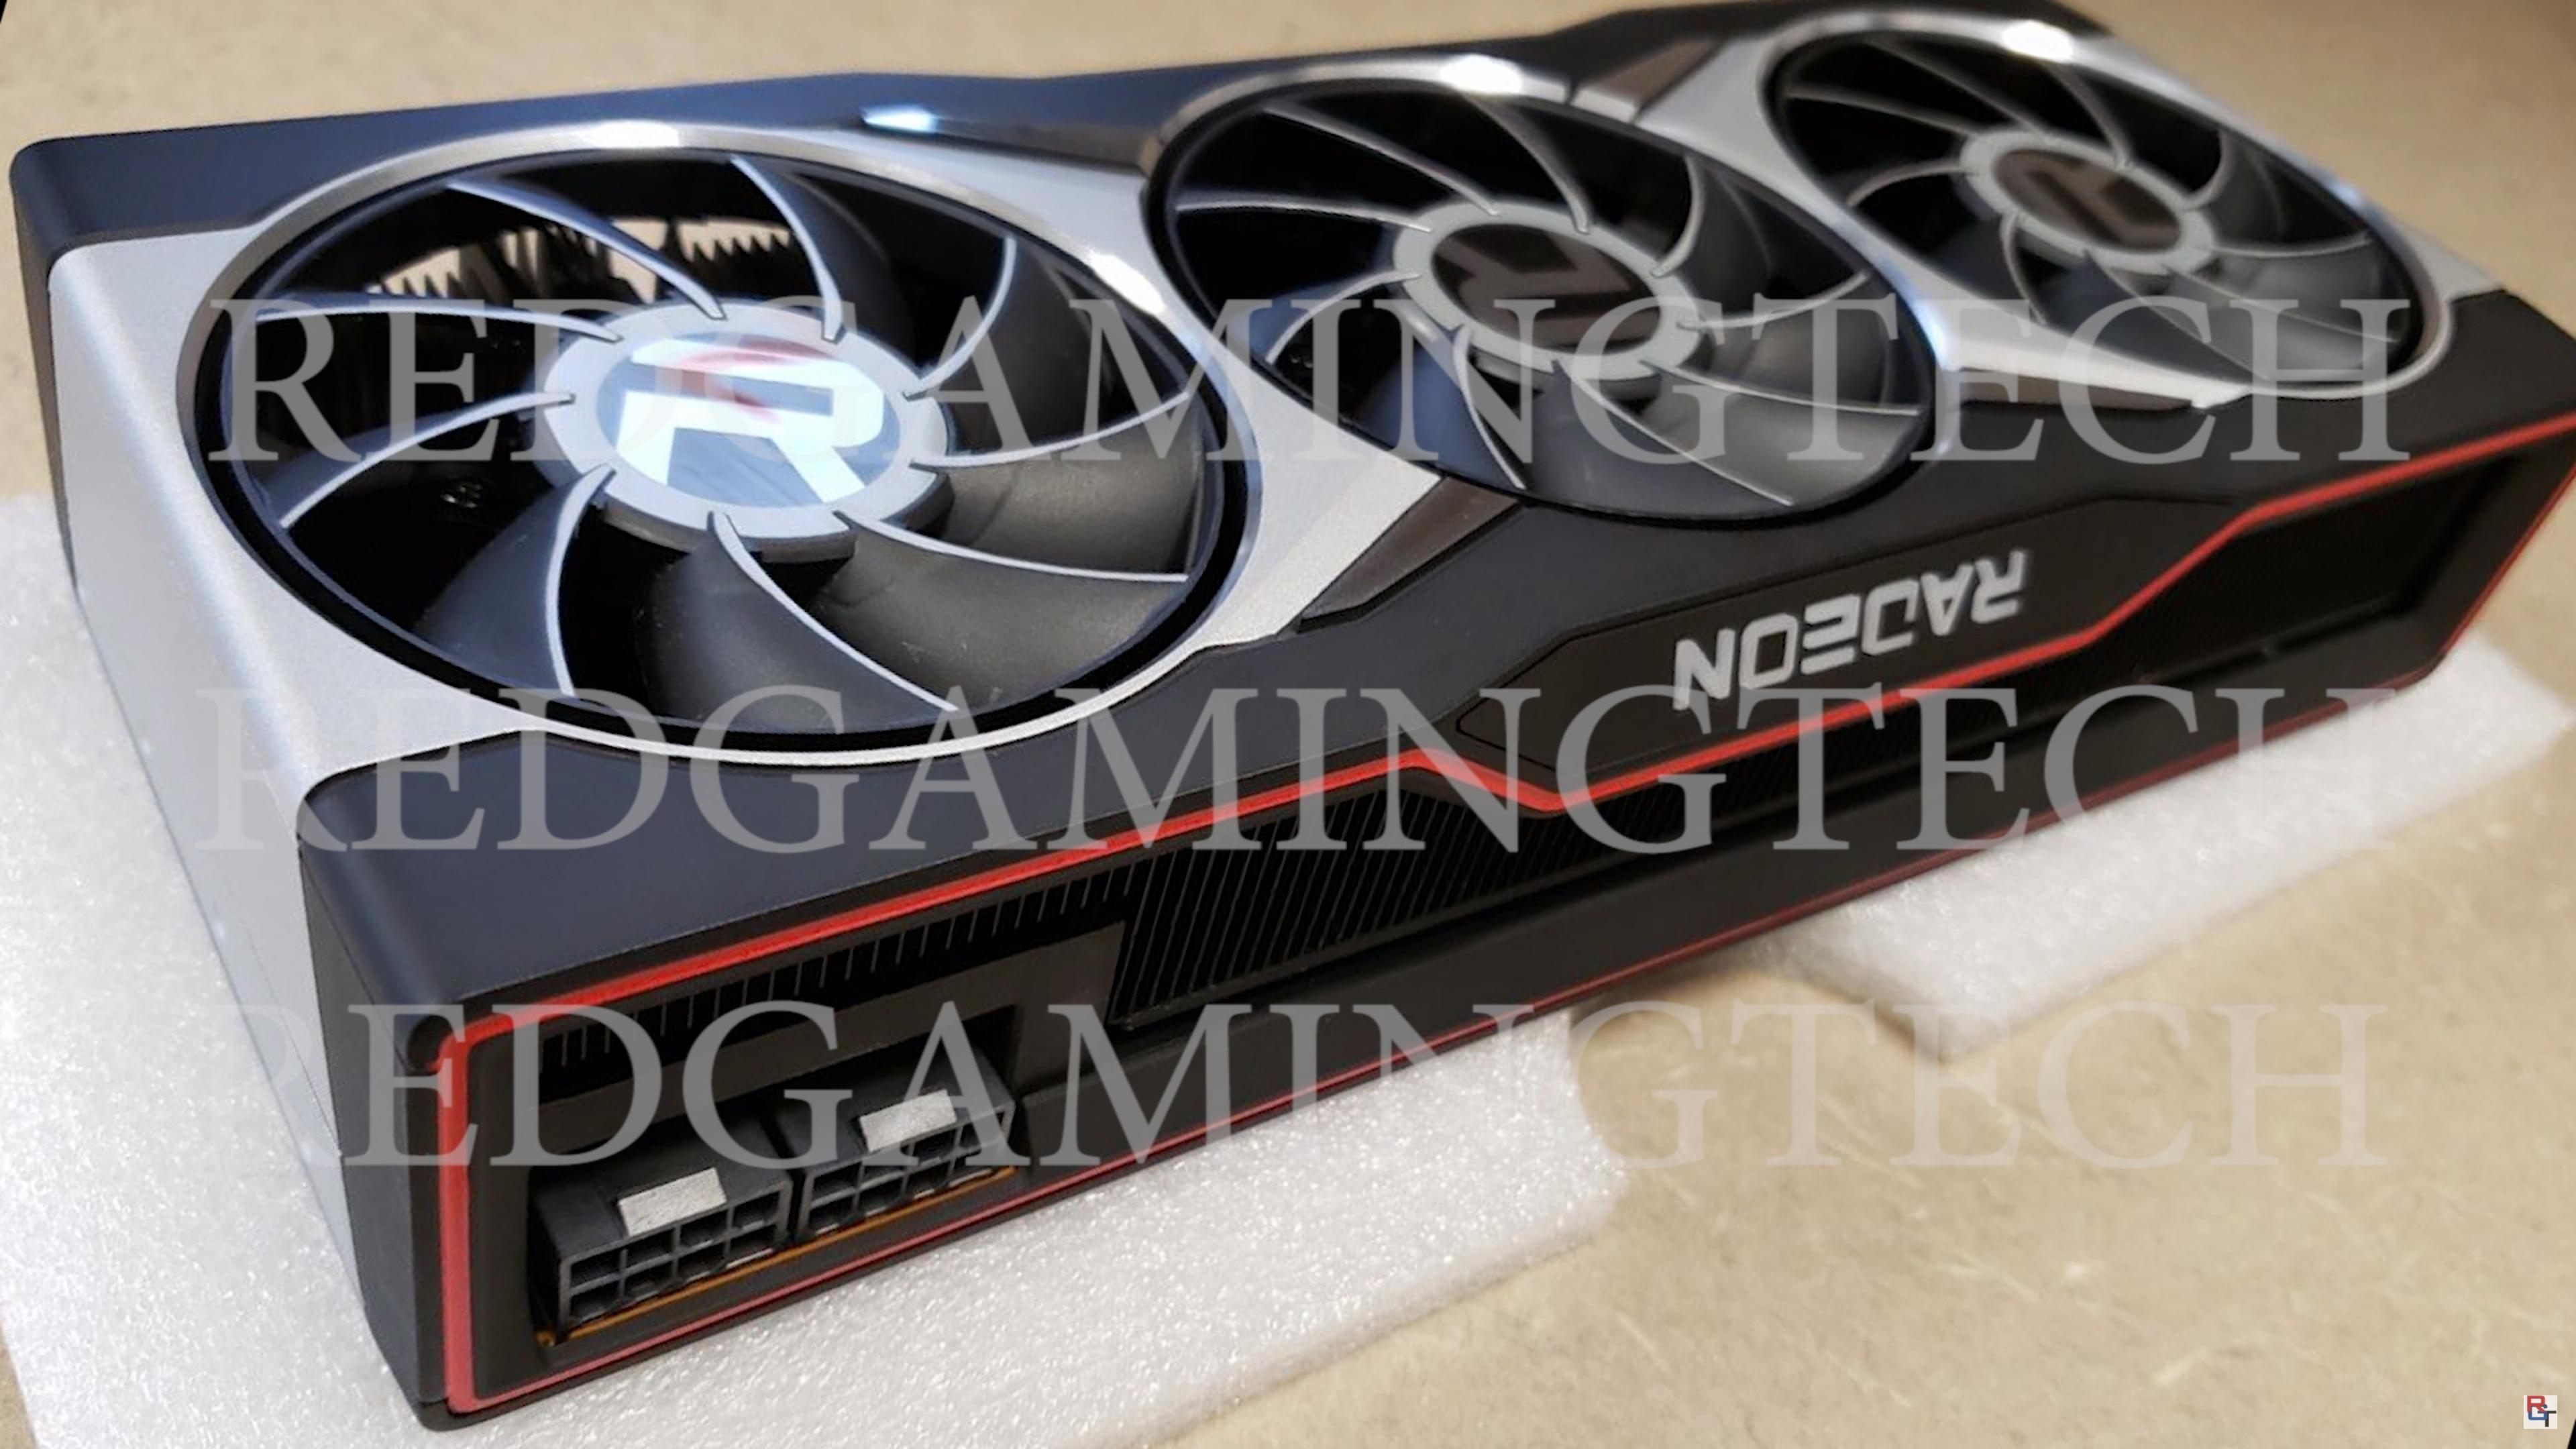 Amd Radeon Rx 6900 Xt Flagship Big Navi Graphics Card Pictured